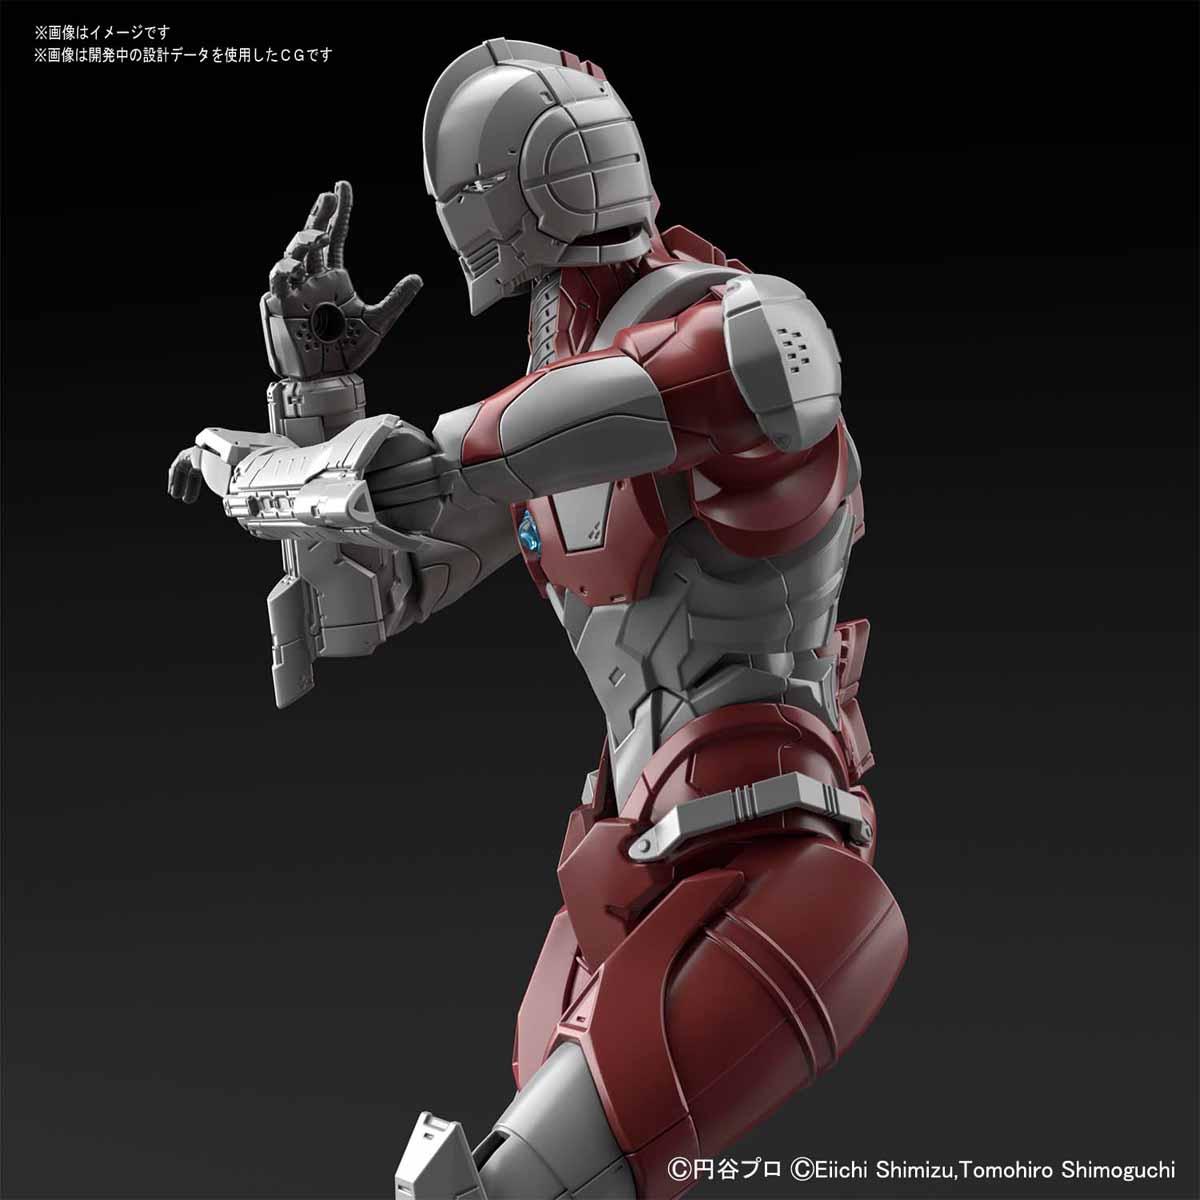 Figure-rise Standard『ULTRAMAN [B TYPE] -ACTION-』ウルトラマンスーツ 1/12 プラモデル-003